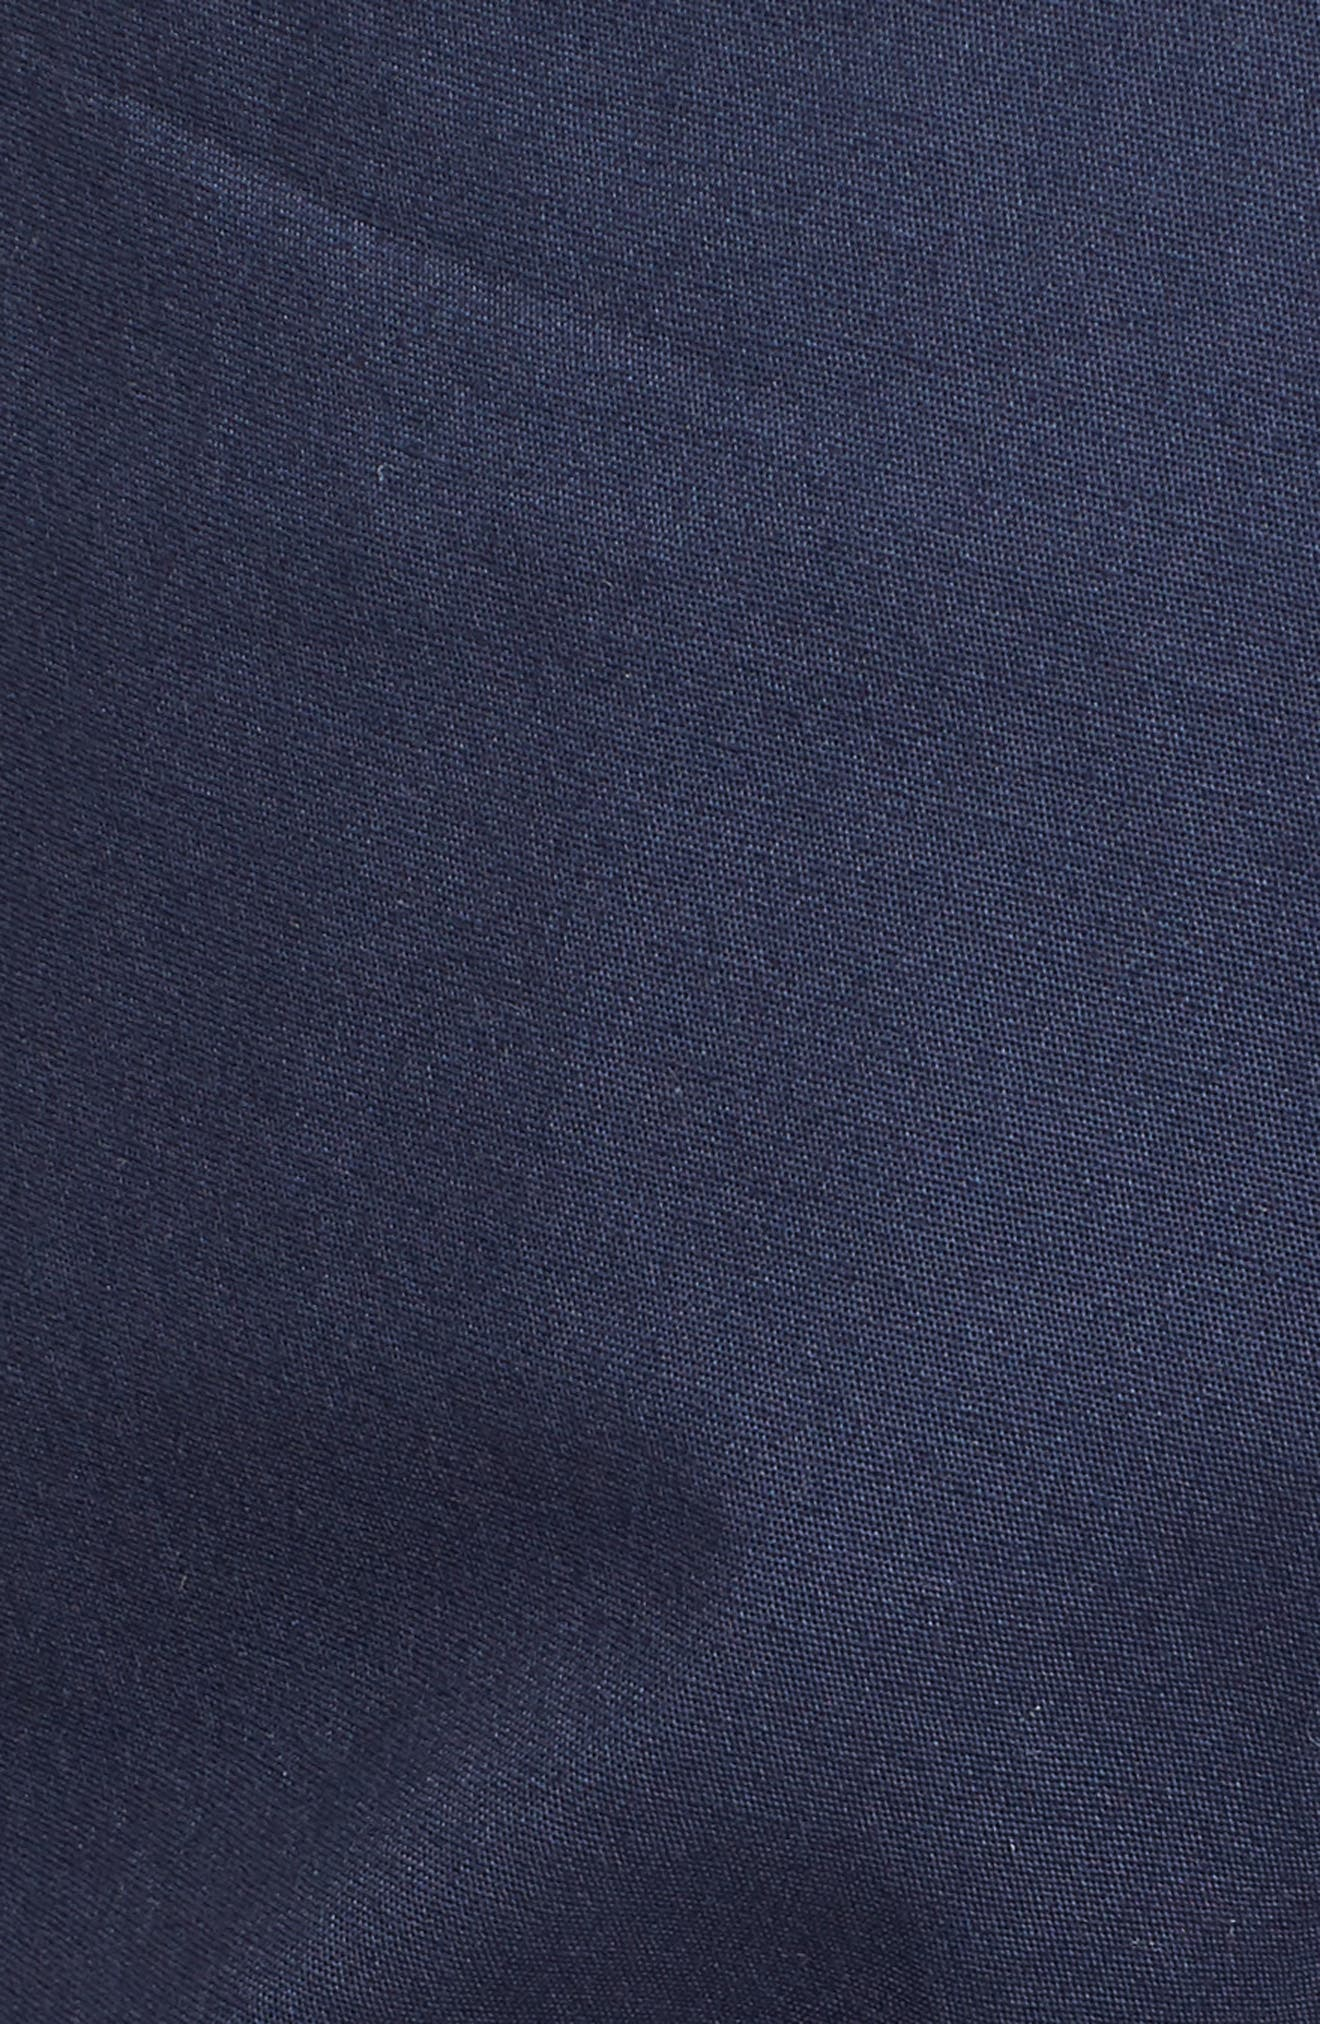 Tie Cuff Stretch Cotton Crop Pants,                             Alternate thumbnail 6, color,                             Ensign Blue